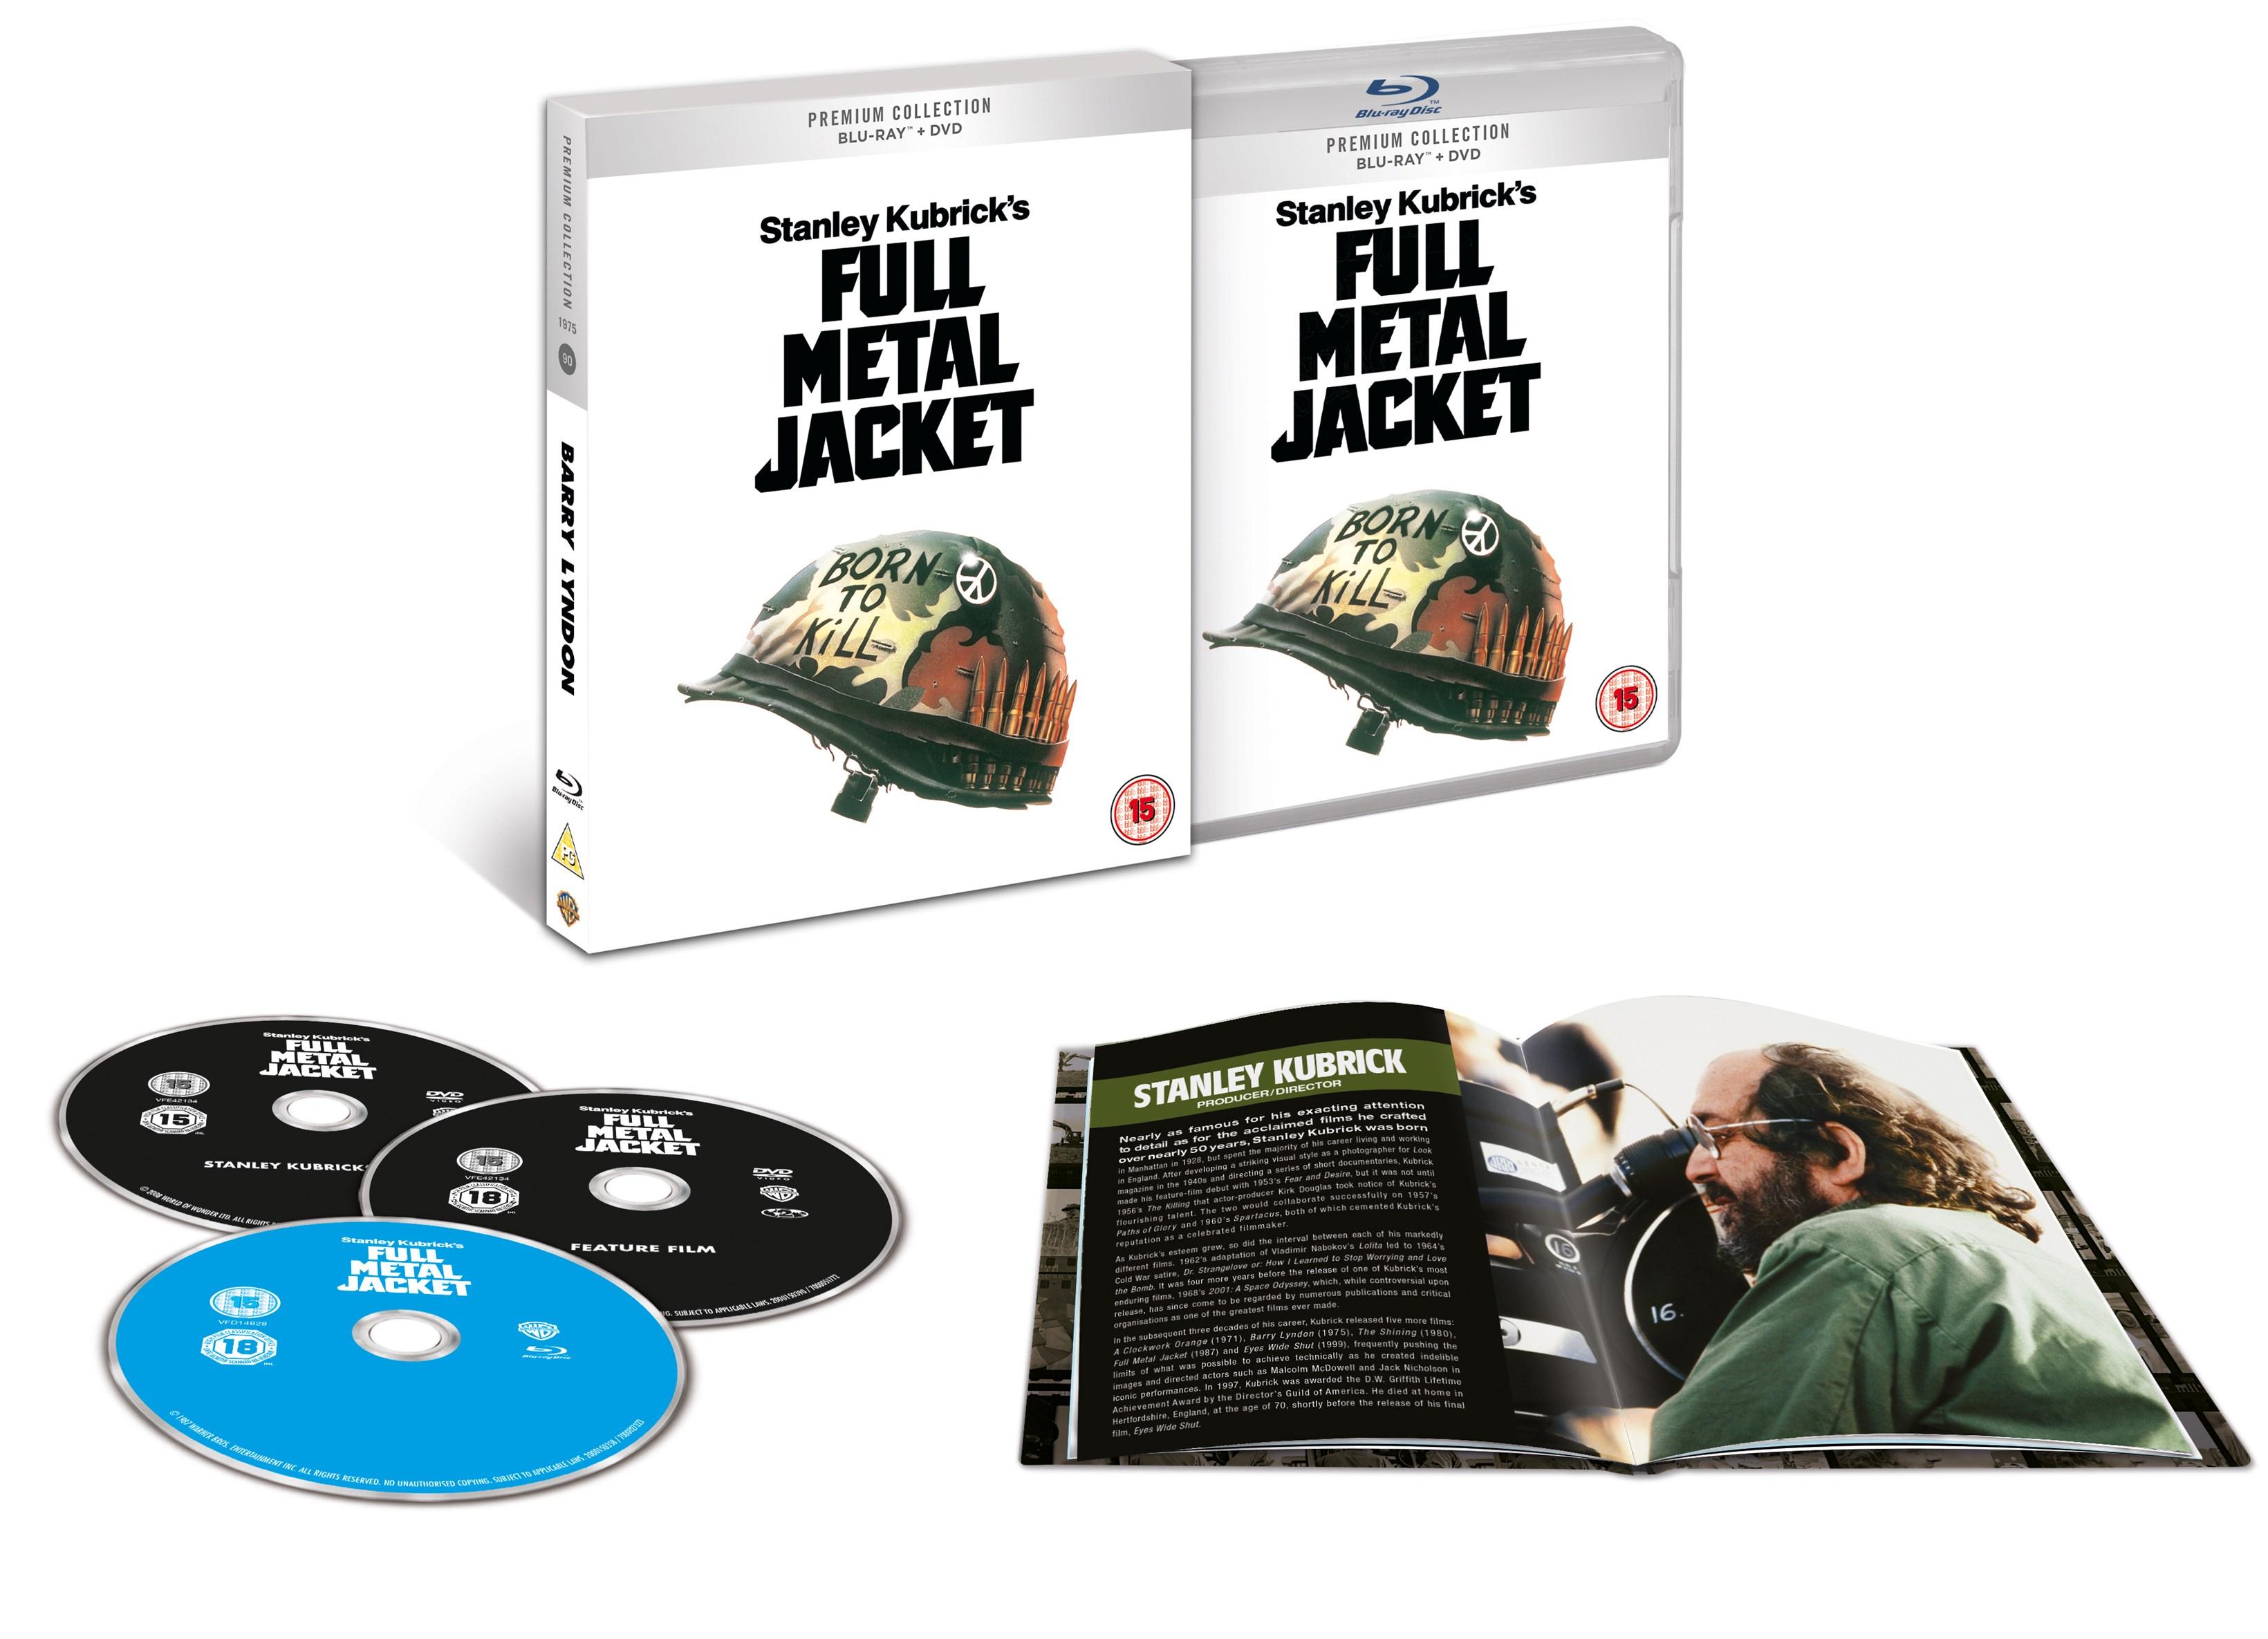 Full Metal Jacket (hmv Exclusive) - The Premium Collection - 3